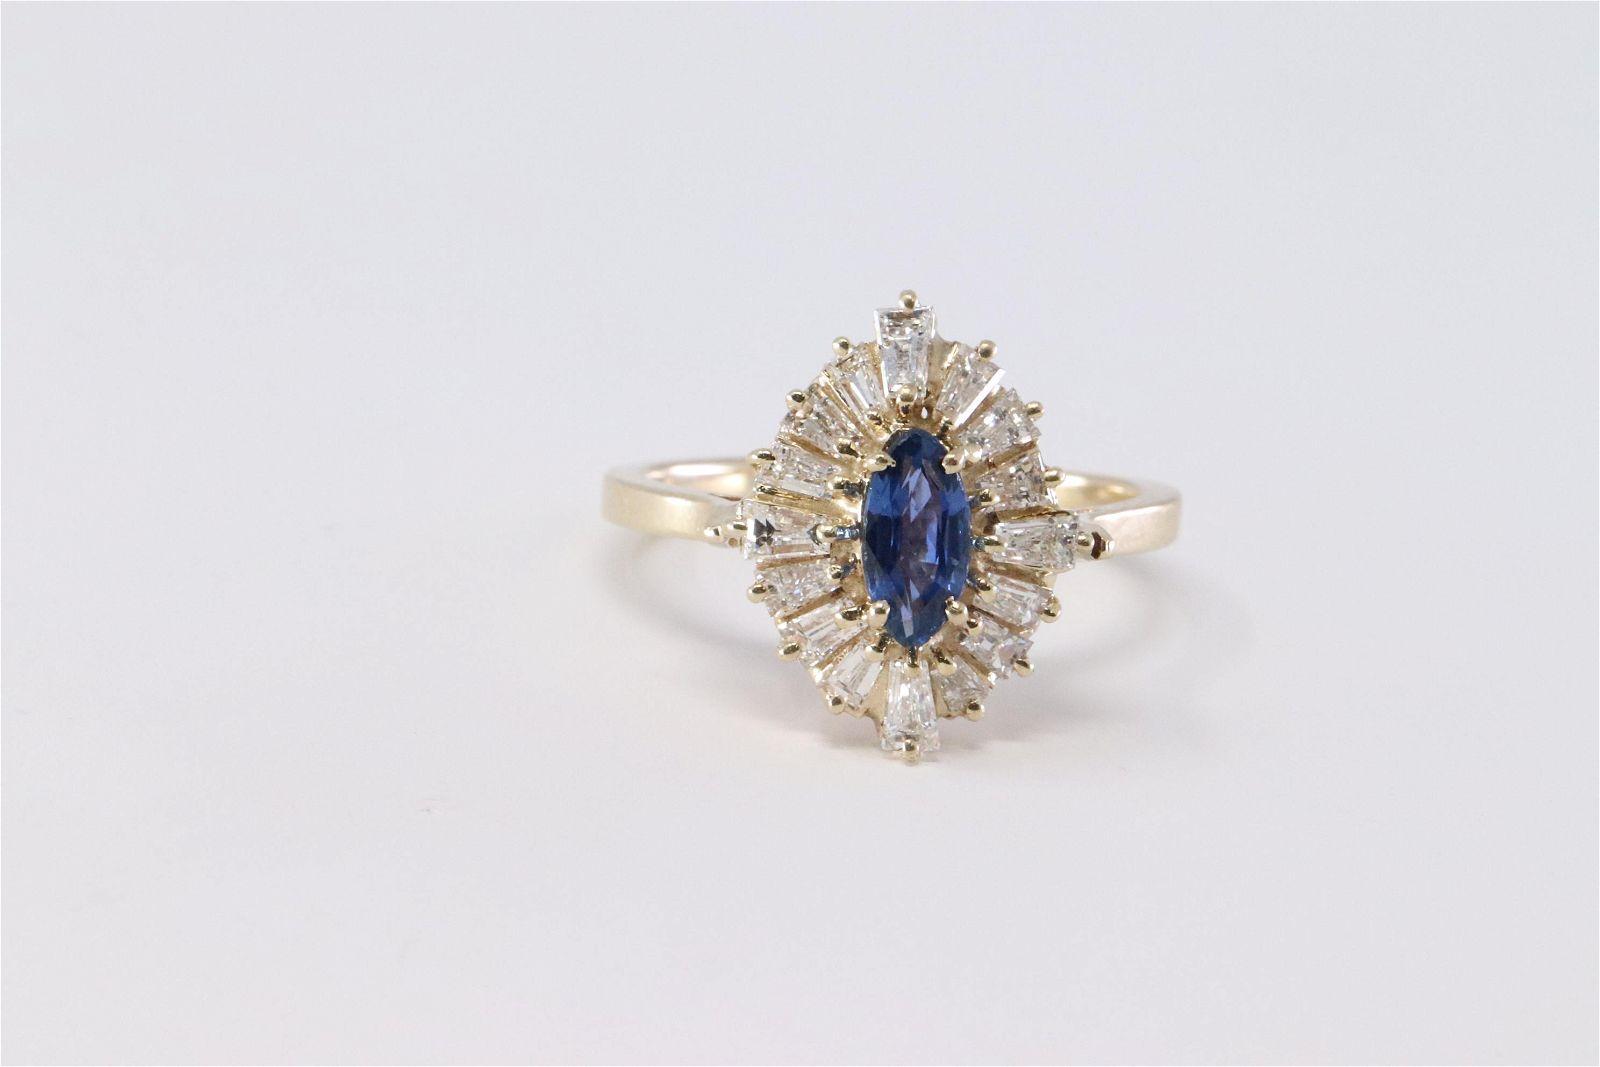 14Kt Baguette Diamonds w/ Sapphire Stone in Center